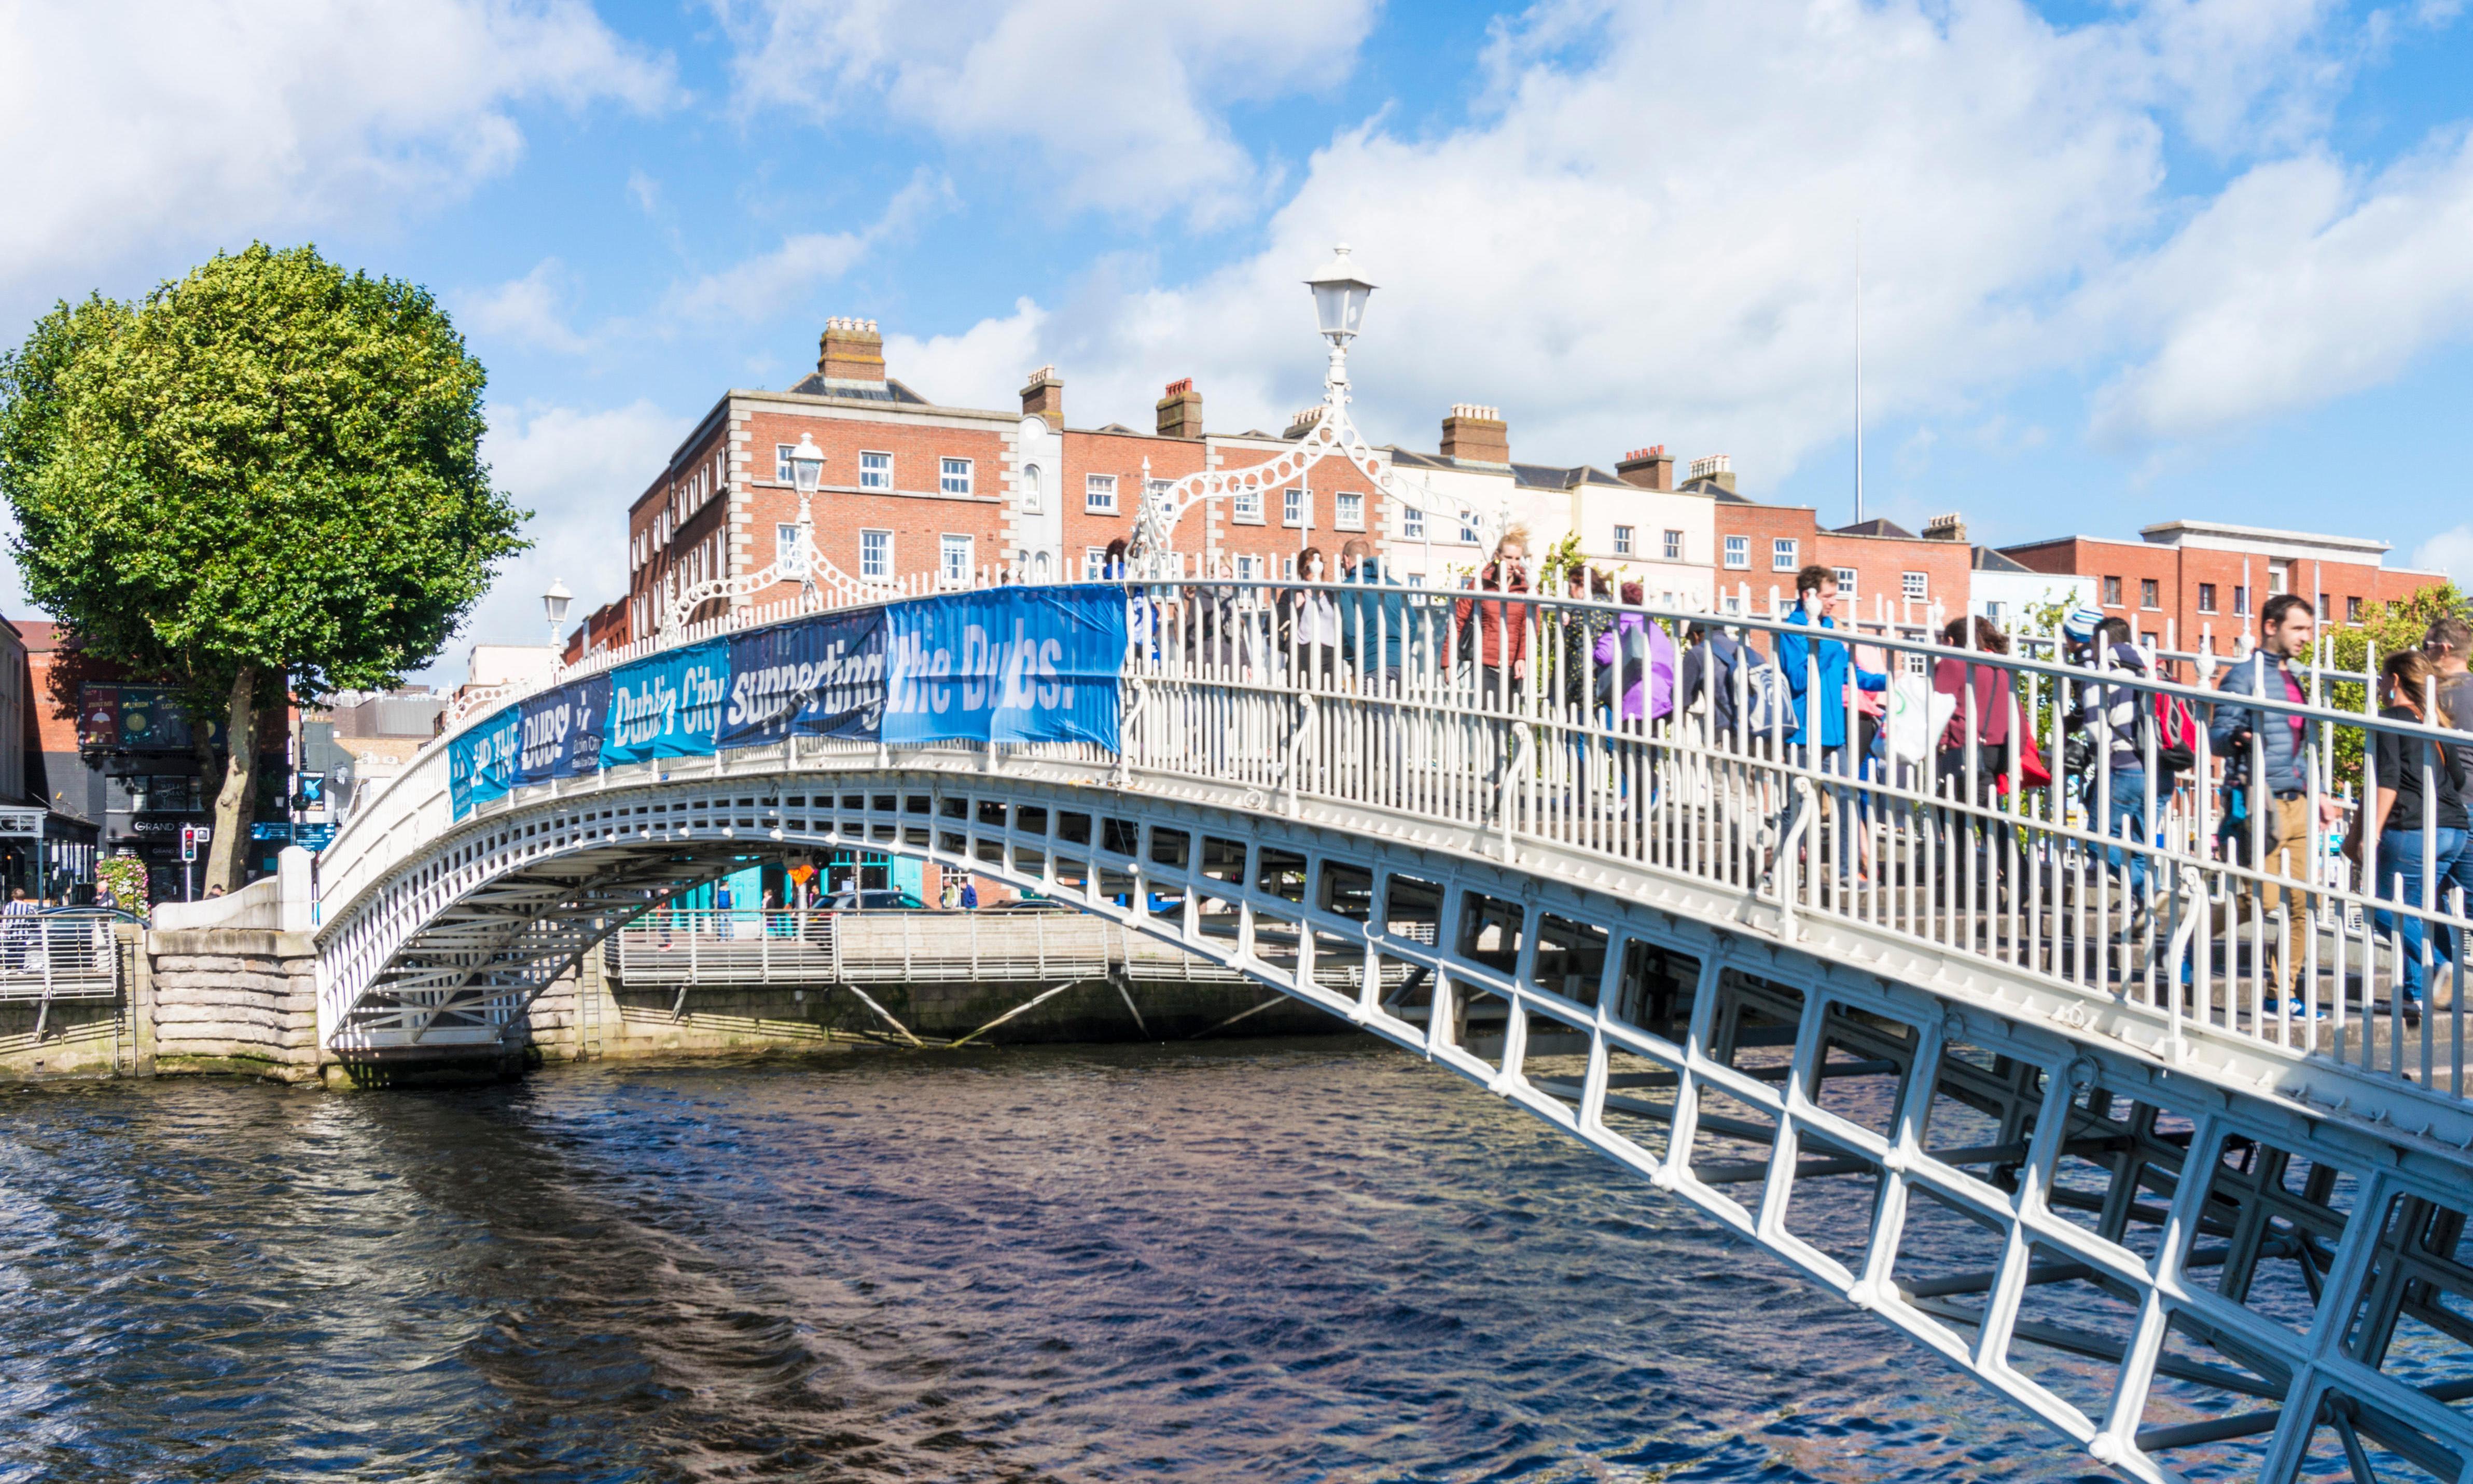 Coats for homeless removed from Dublin's Ha'penny Bridge